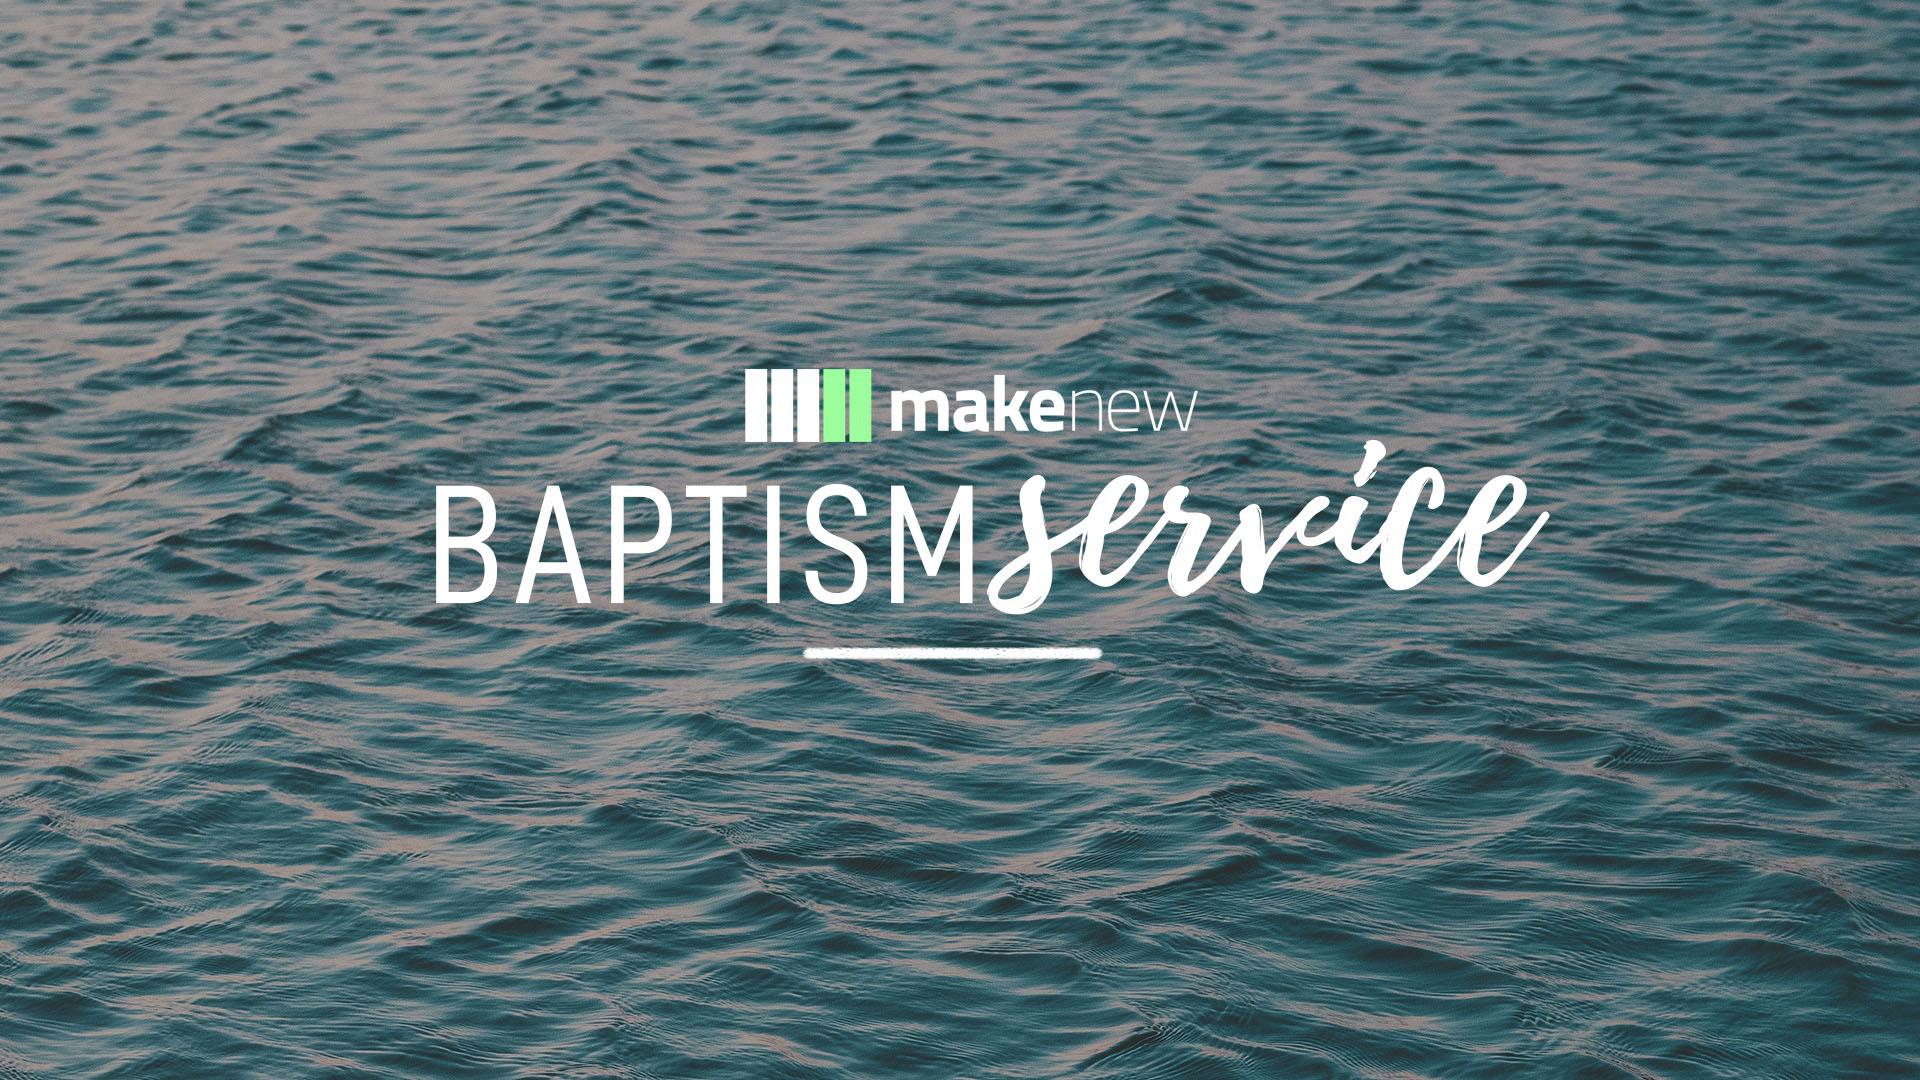 BaptismSWS_2019_1920x1080.jpg